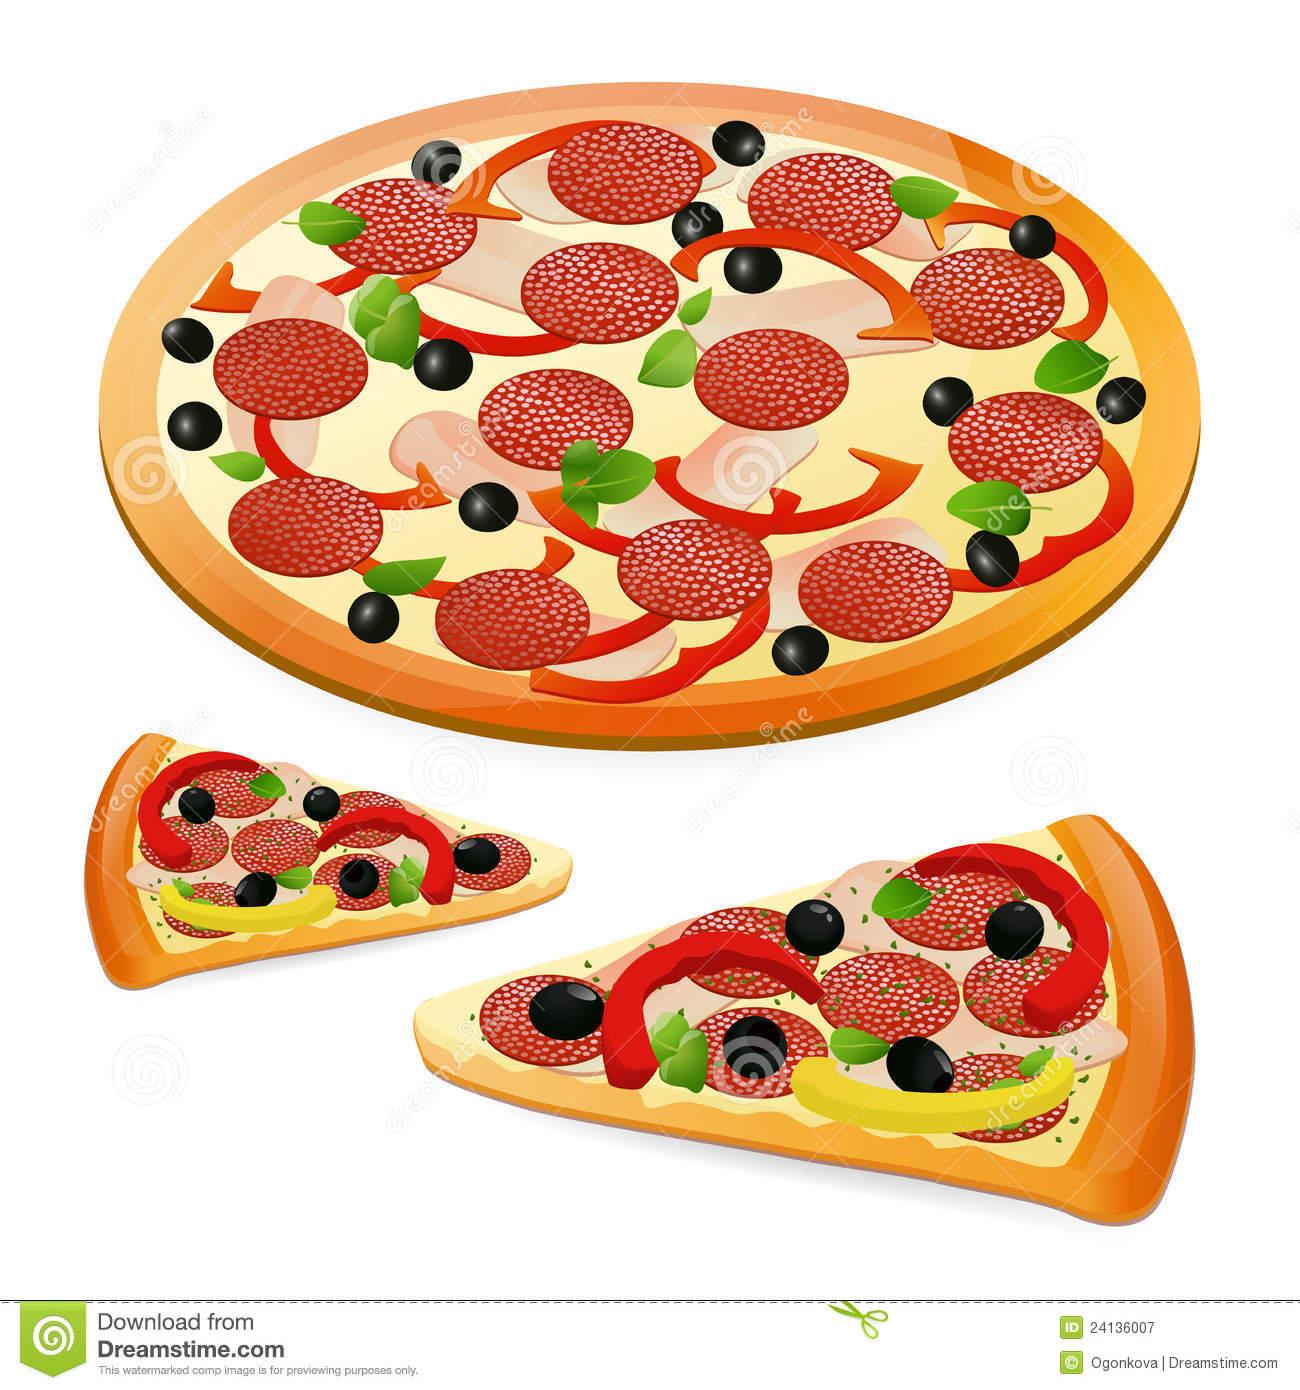 Pizza royalty free stock .-Pizza royalty free stock .-12